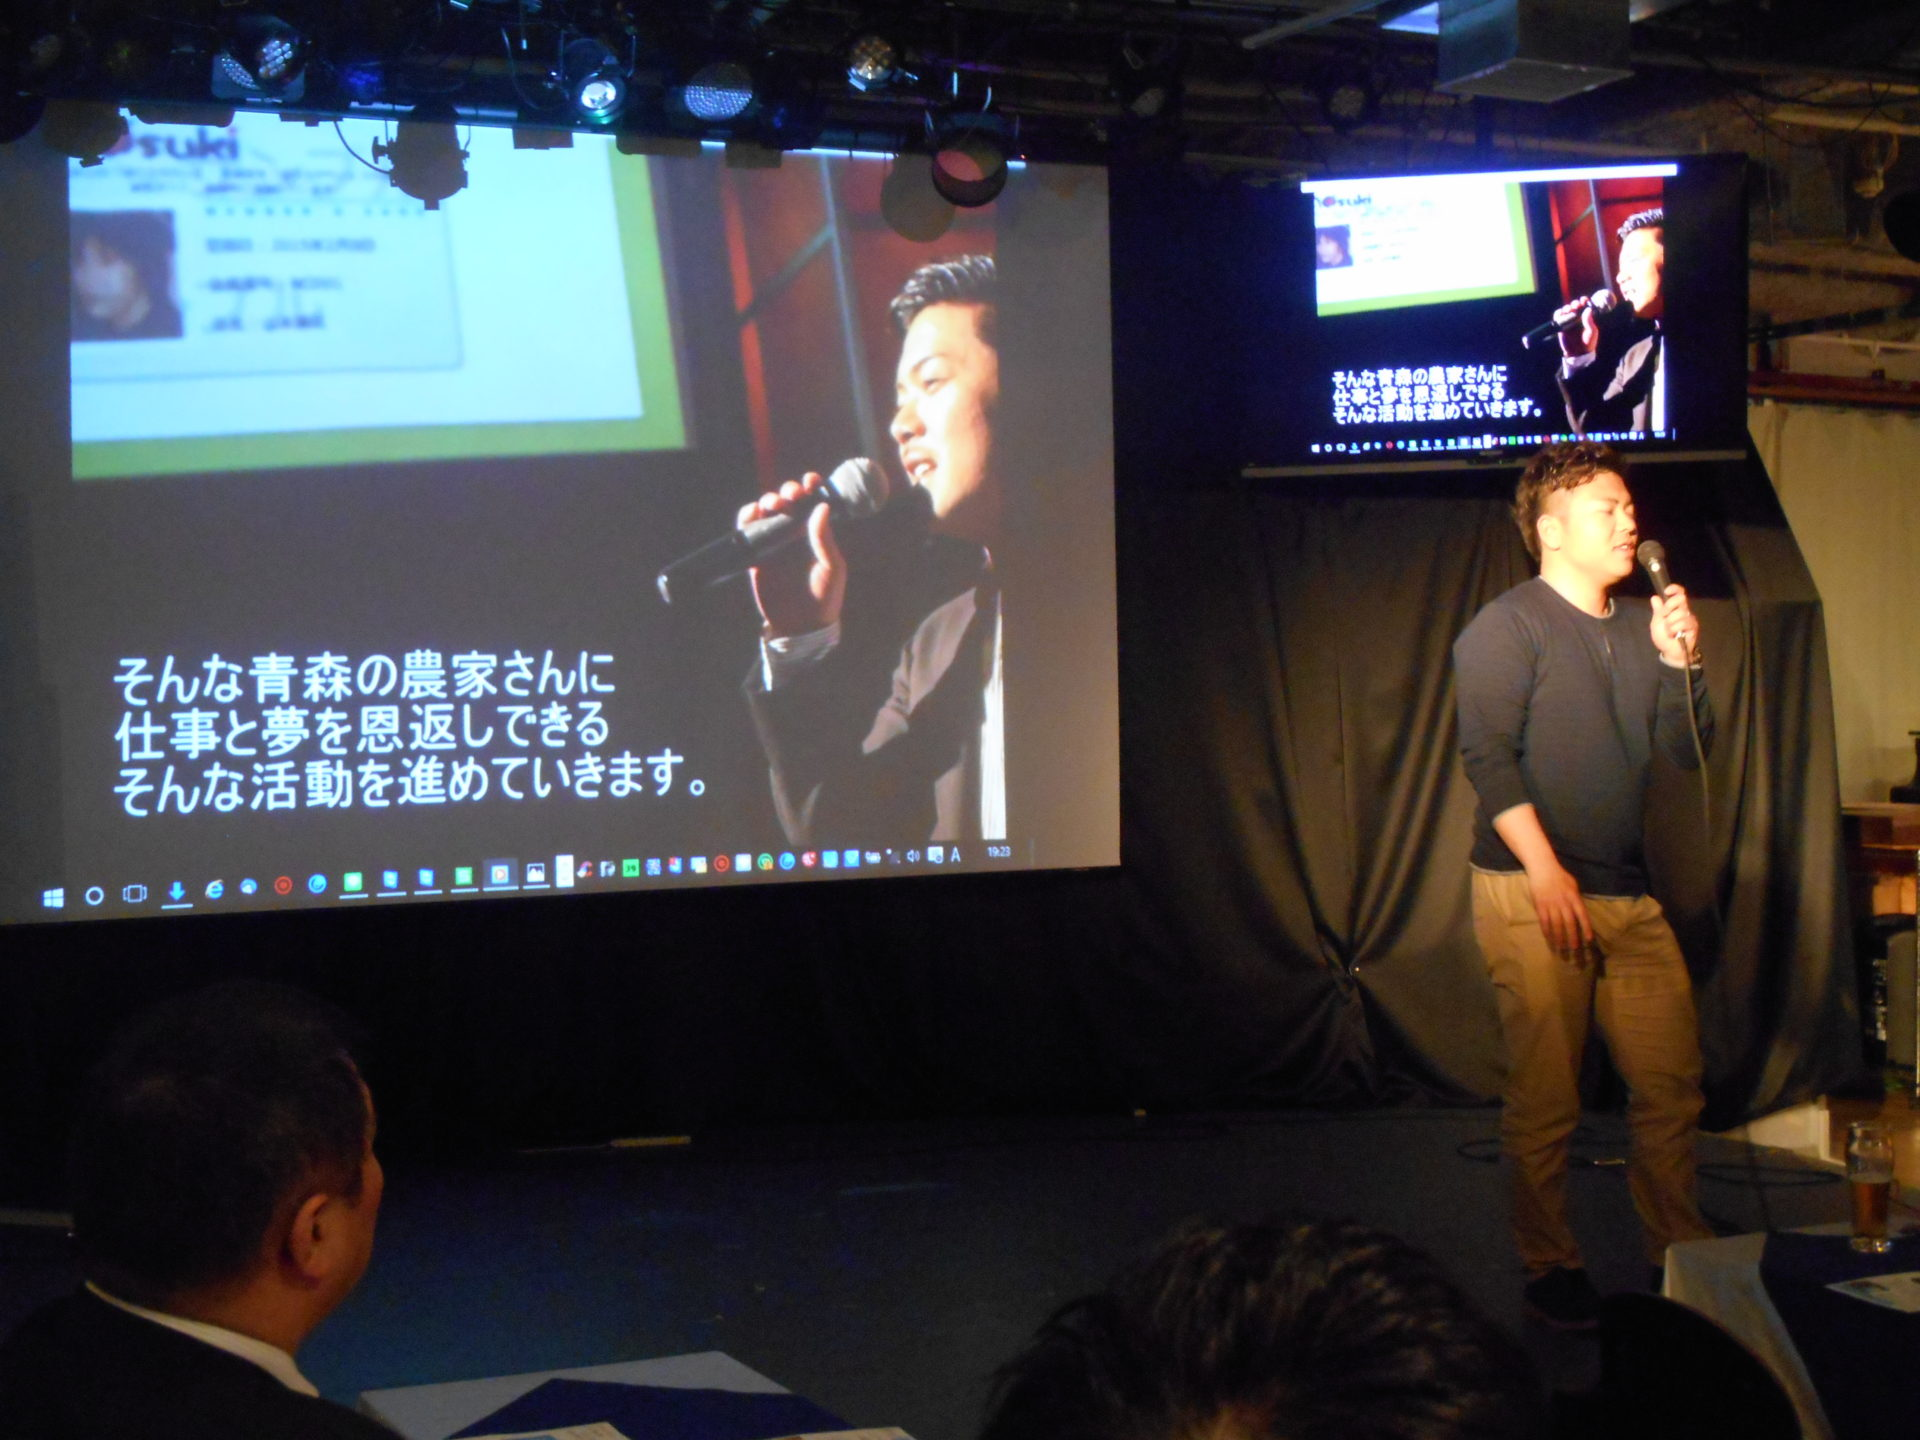 DSCN1032 1920x1440 - 2016年3月11日(金)AOsuki総会&パーティー開催しました。